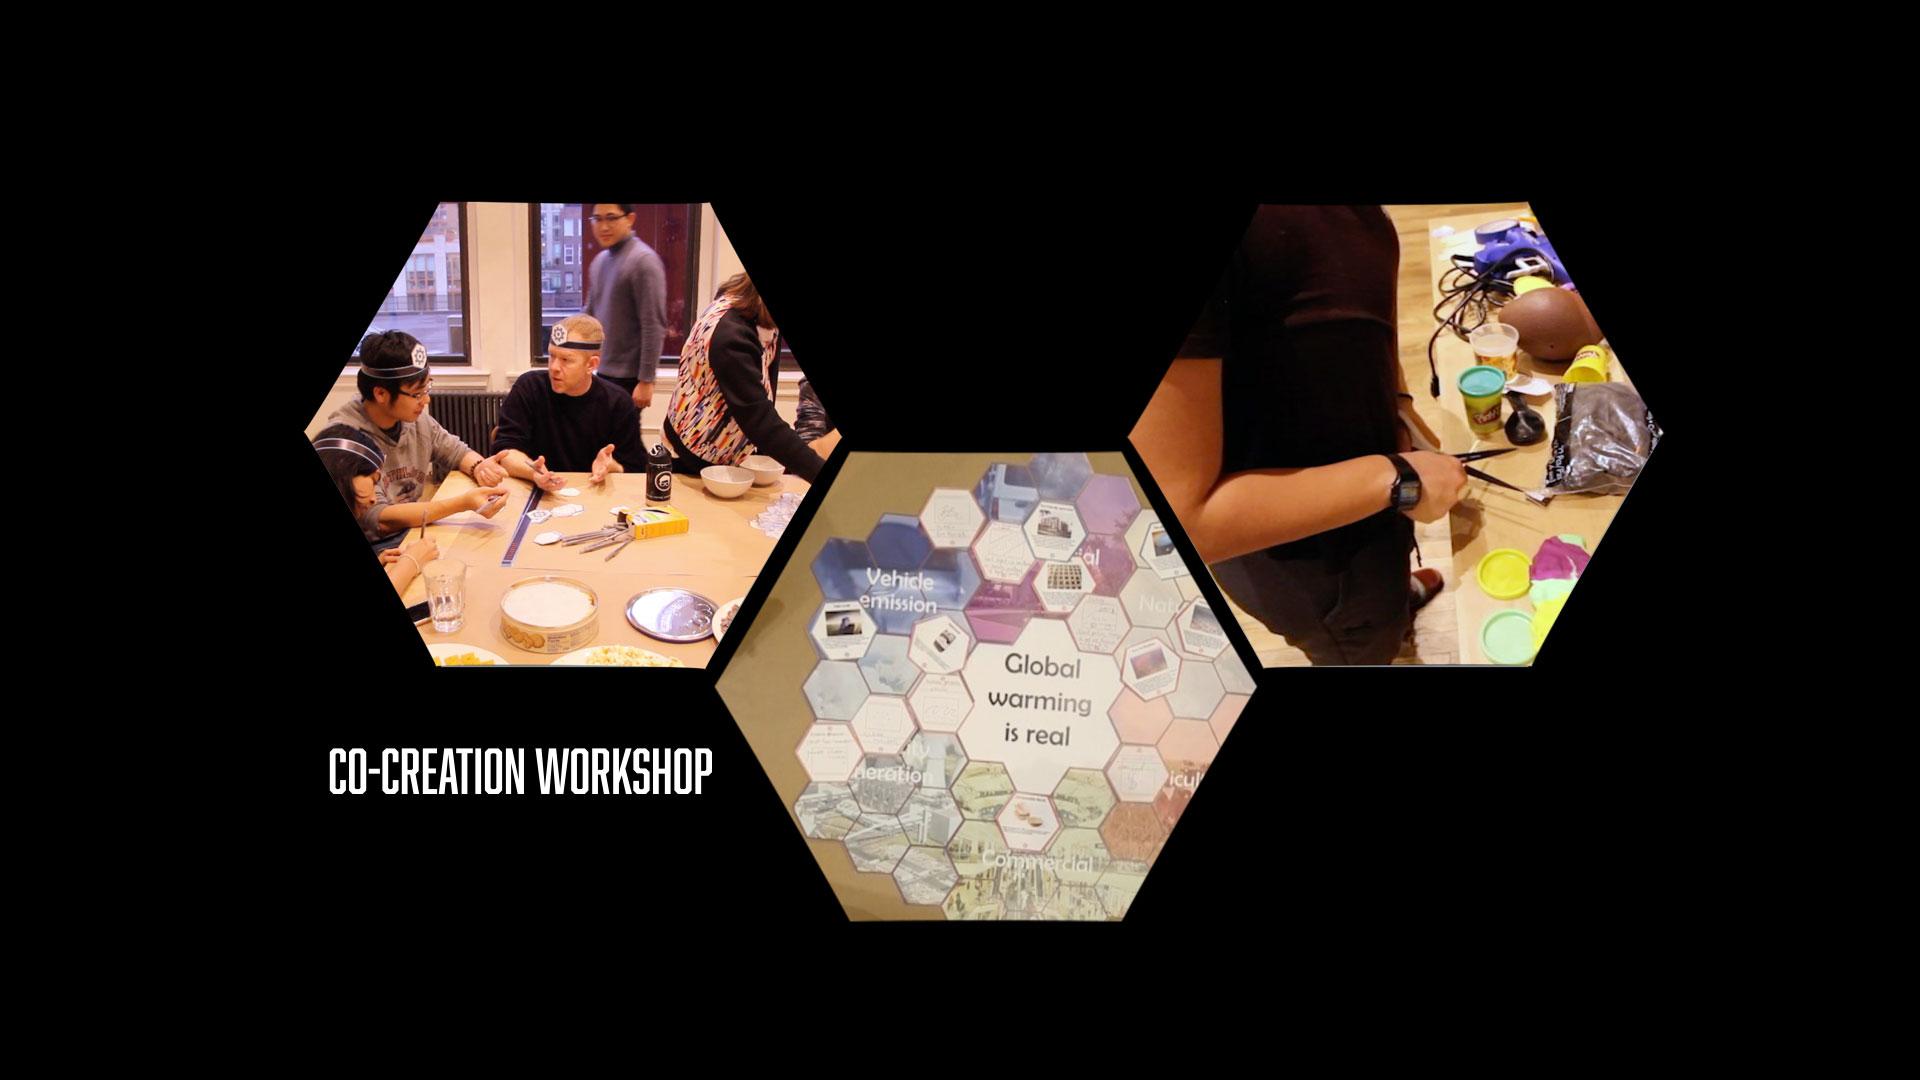 Xu_Co-creation-workshop.jpg